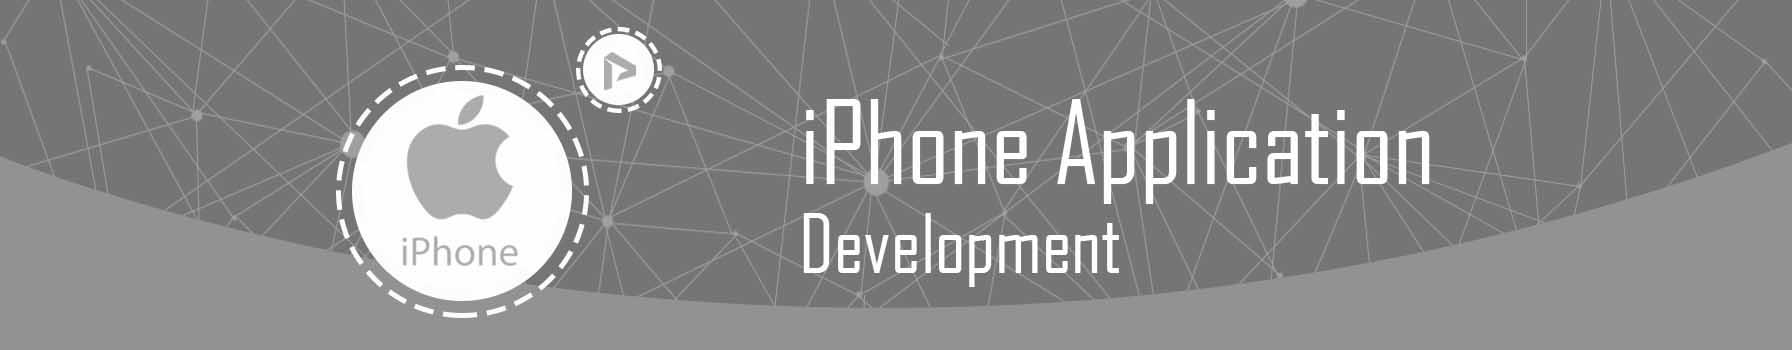 iPhone-application-development.jpg